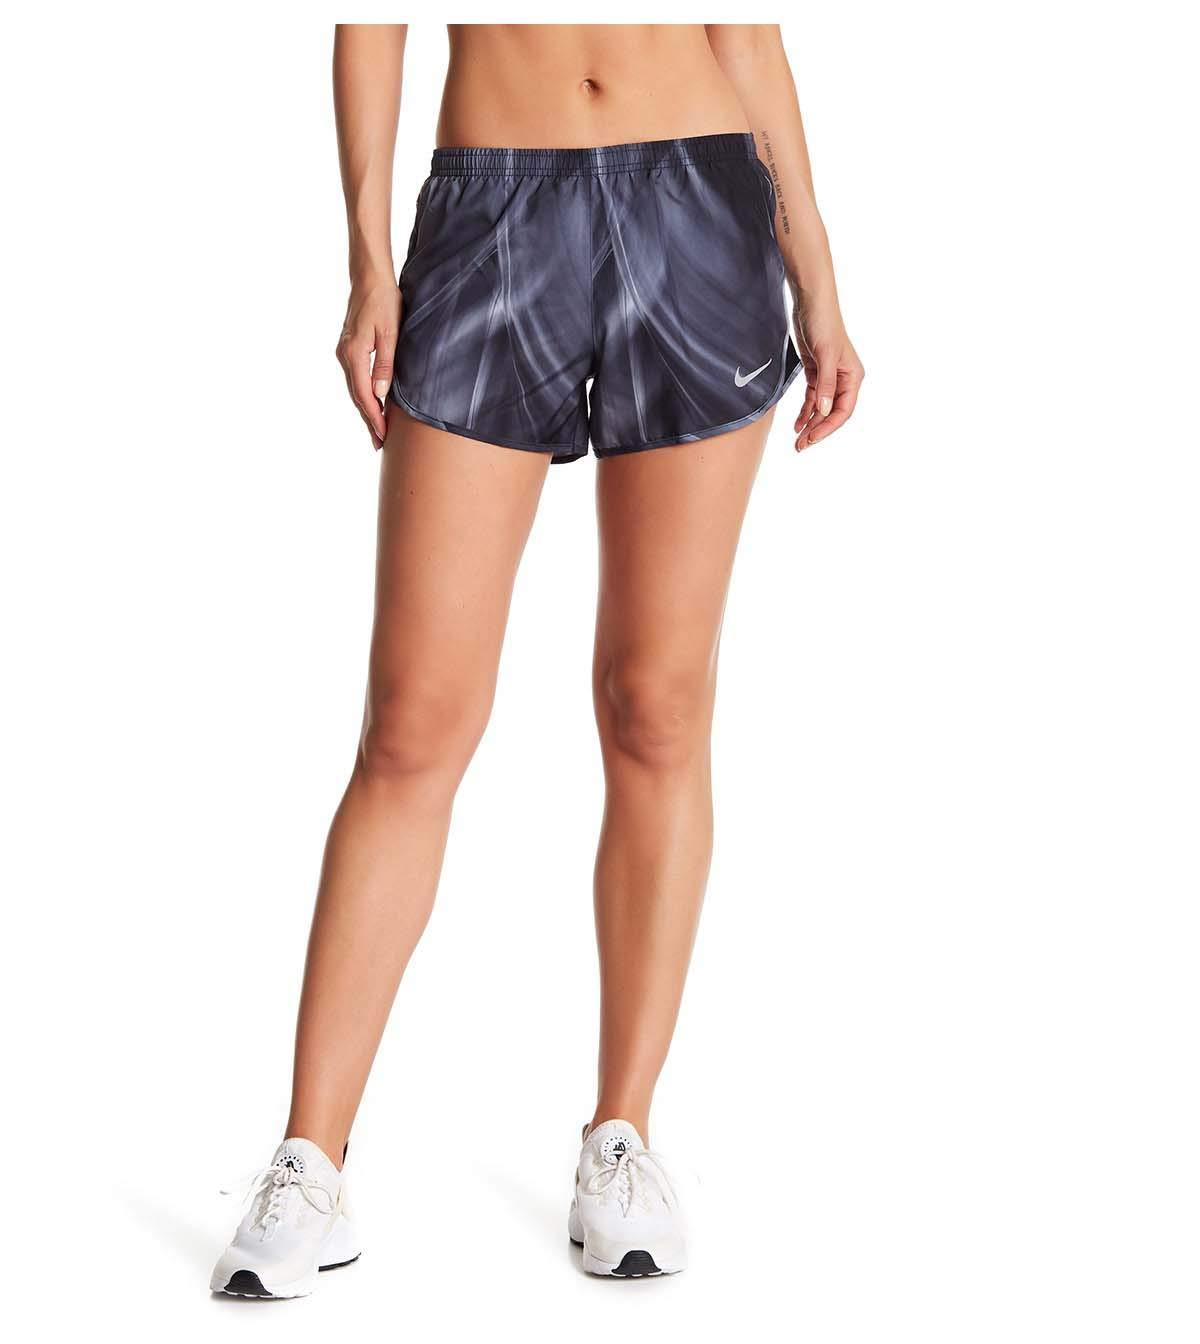 966349e7dd1 Galleon - NIKE Women's Dry Tempo Running Shorts (Grey/Print/Wolf ...